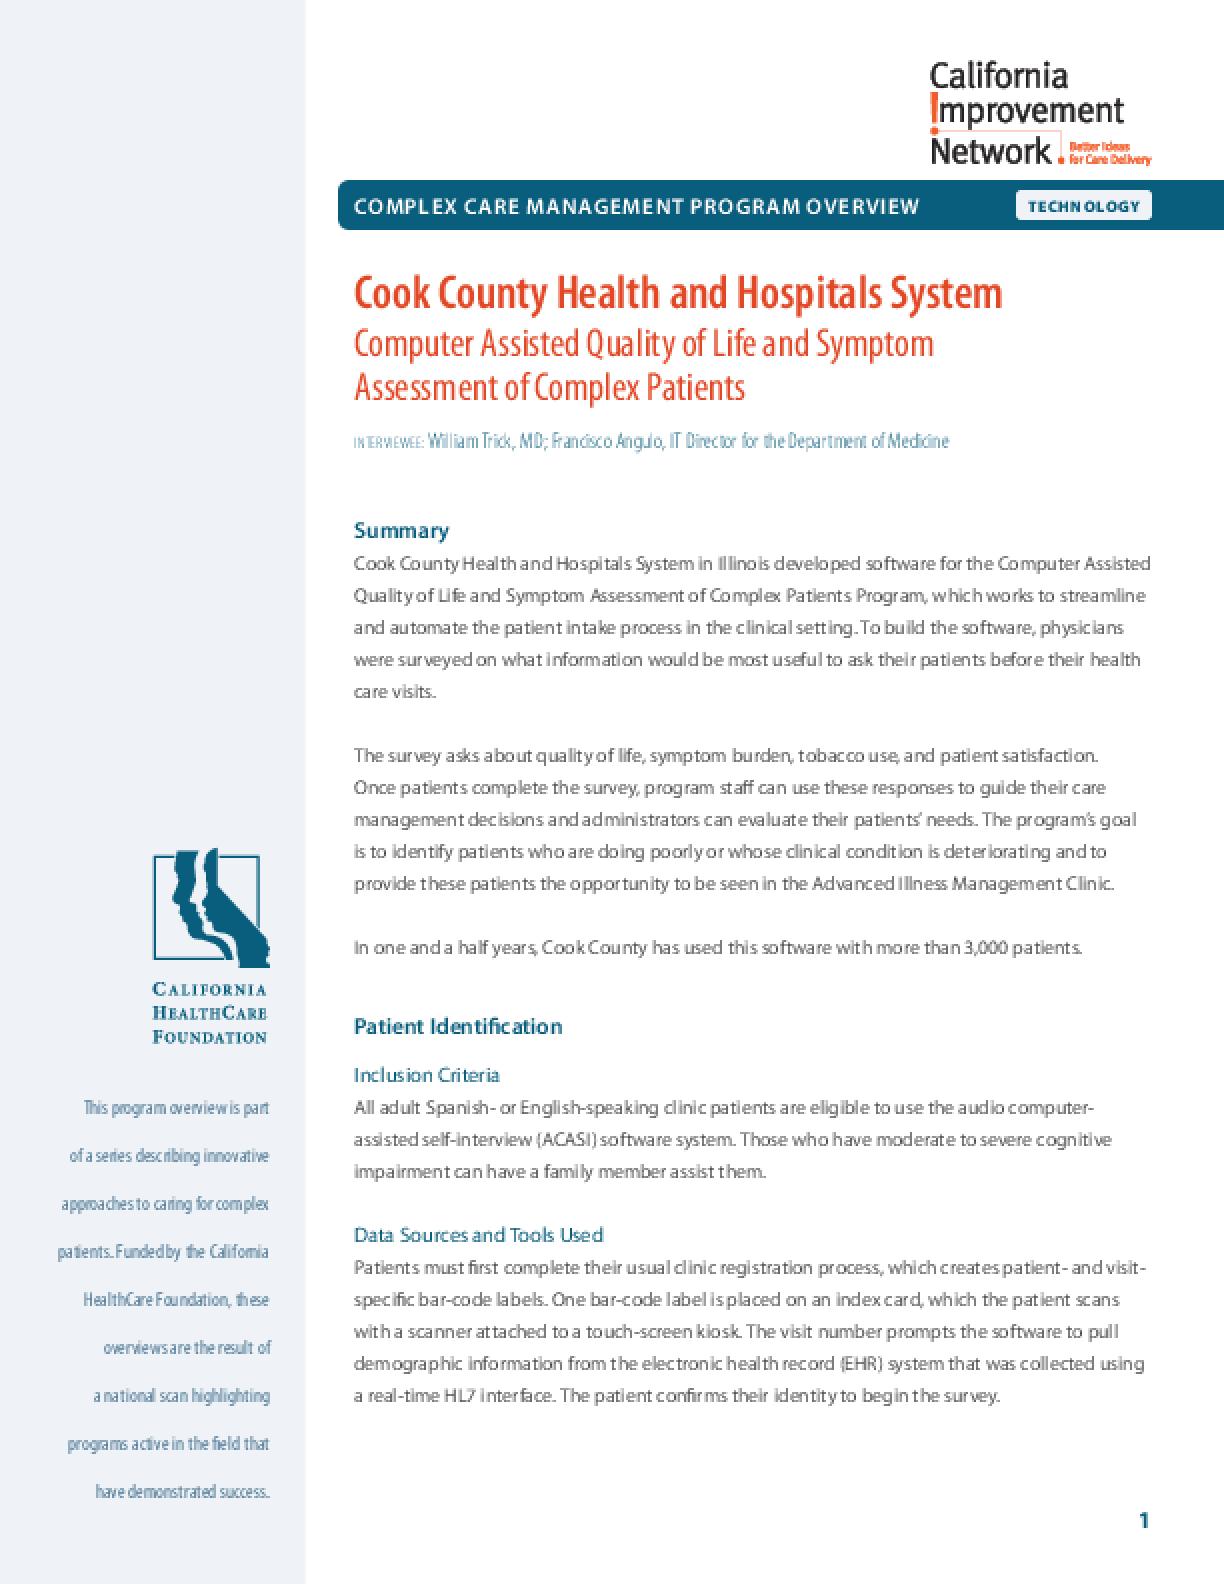 Complex Care Management Program Overview - Technology